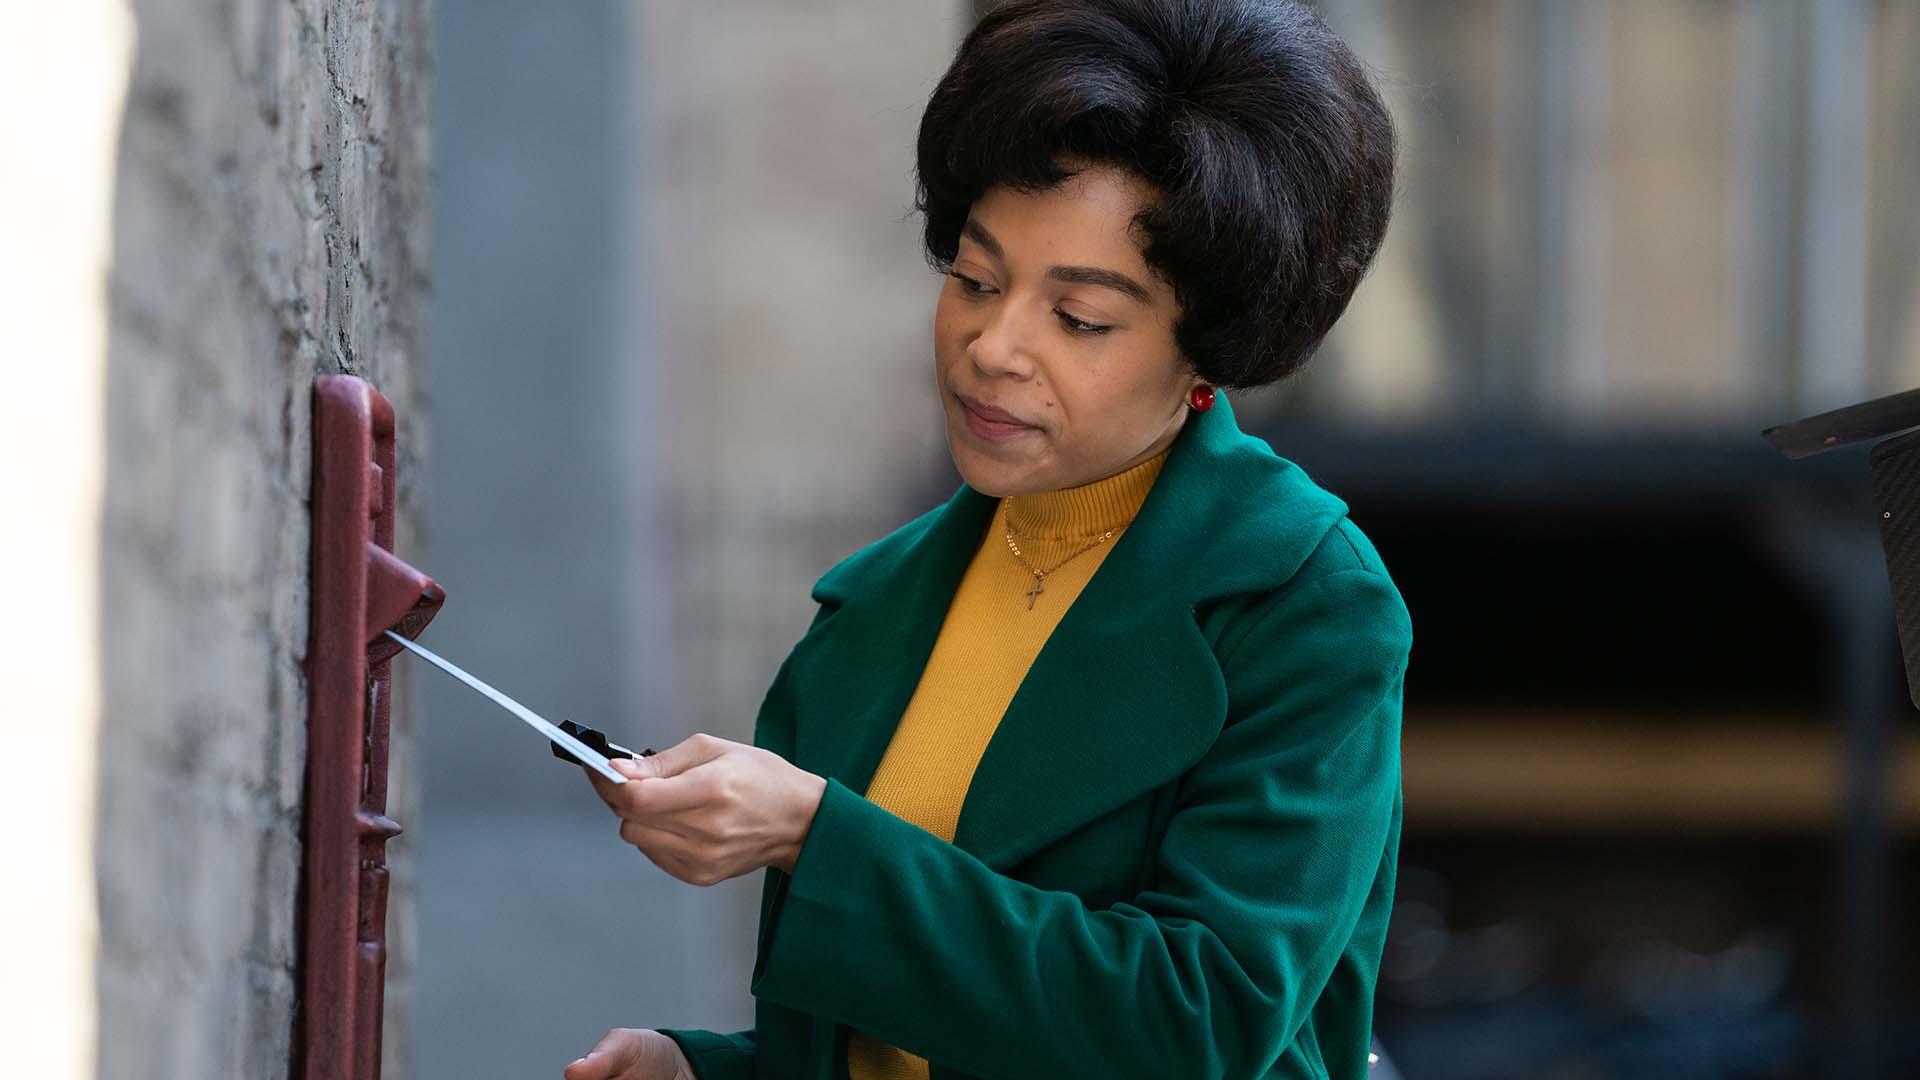 Nurse Lucille Anderson (LEONIE ELLIOTT) placing a letter into a mail slot